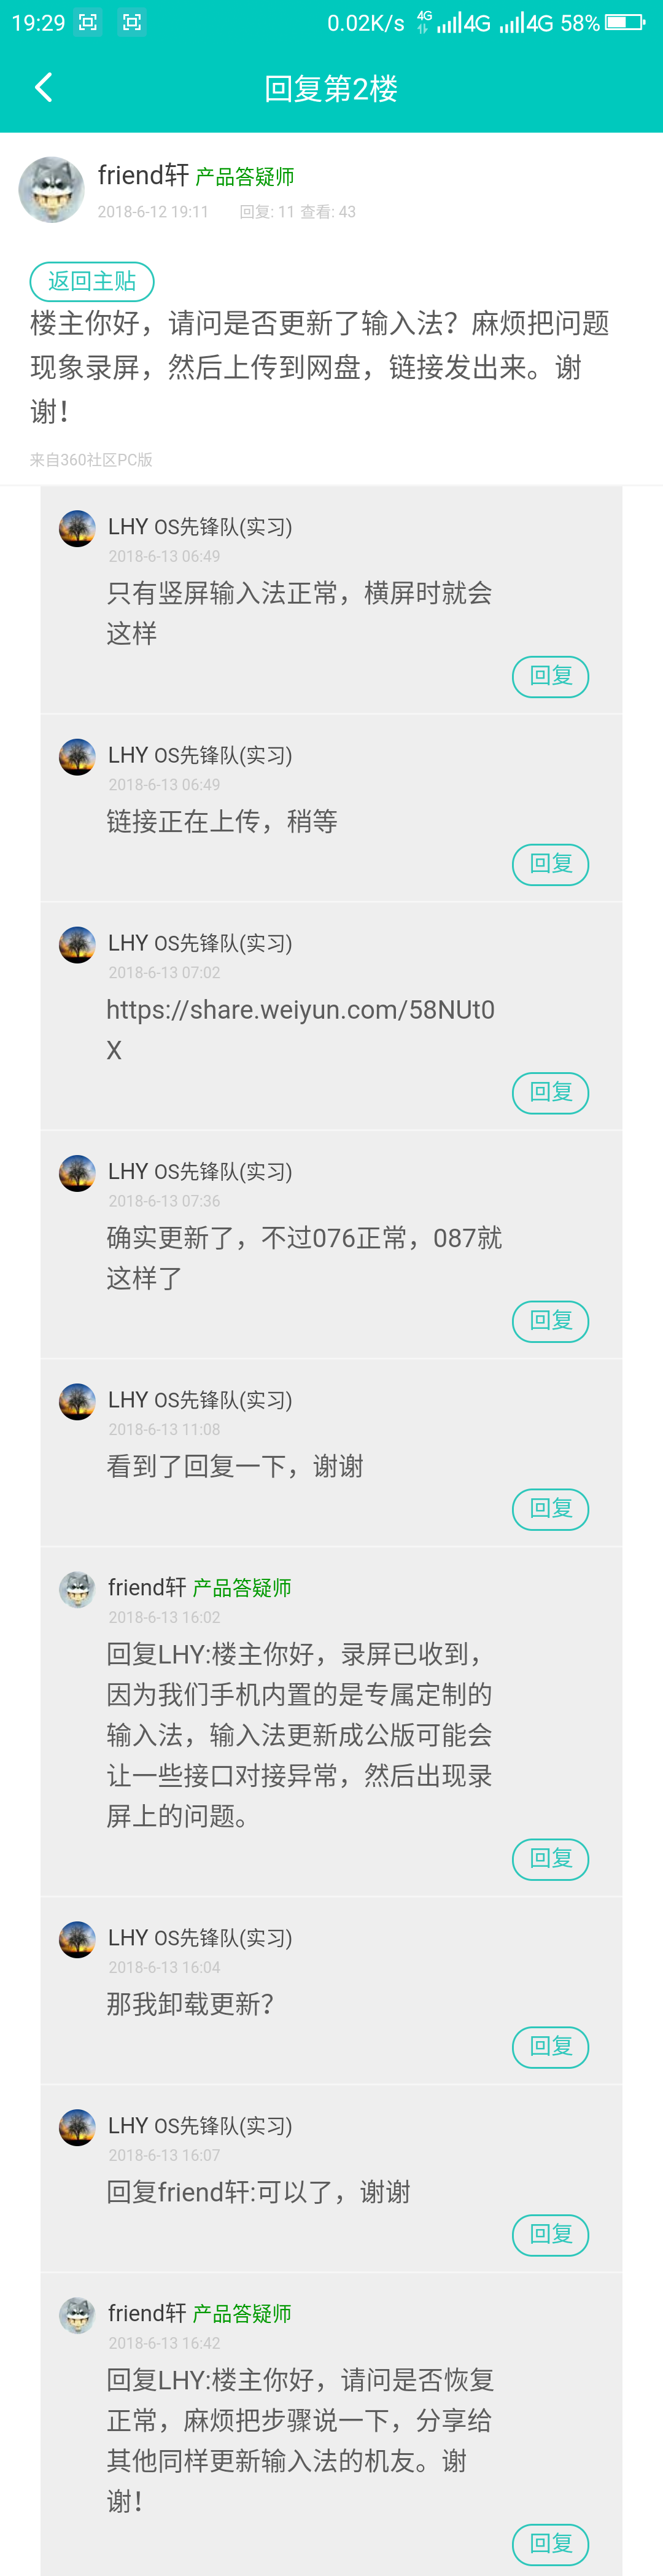 Screenshot_2018-07-14-19-30-00.png